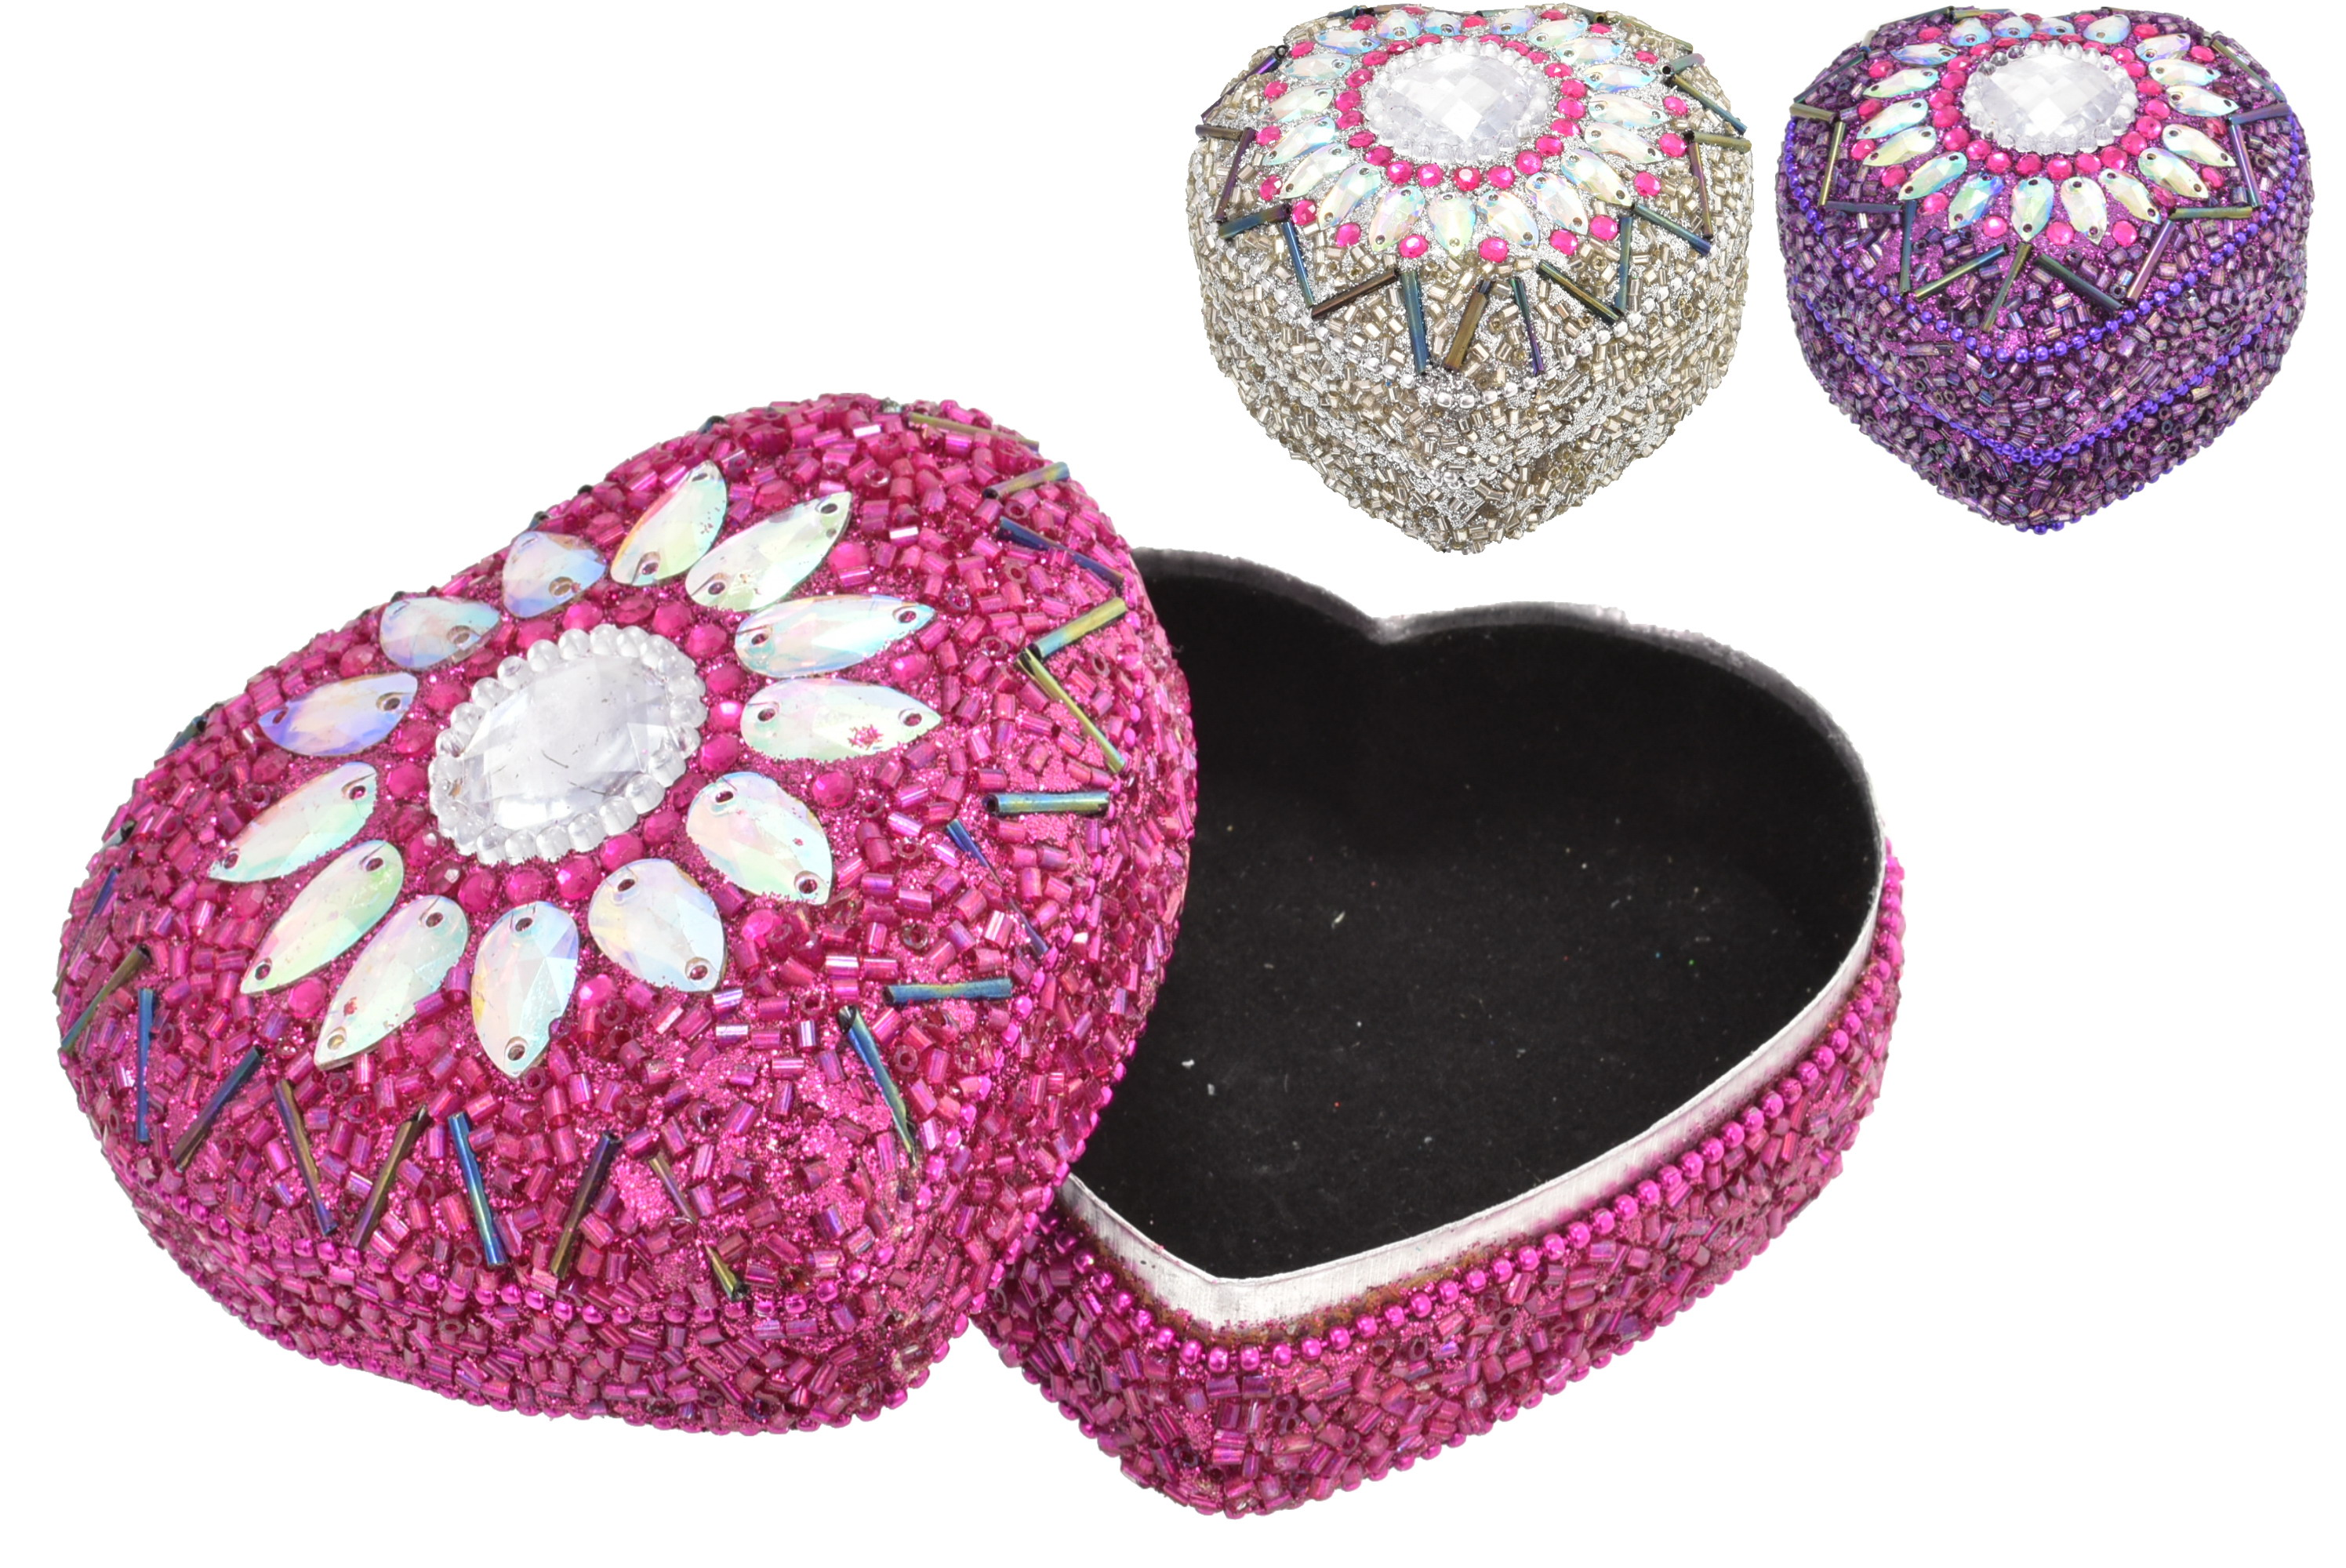 10cm Heart Trinket Box 4 Assorted Designs